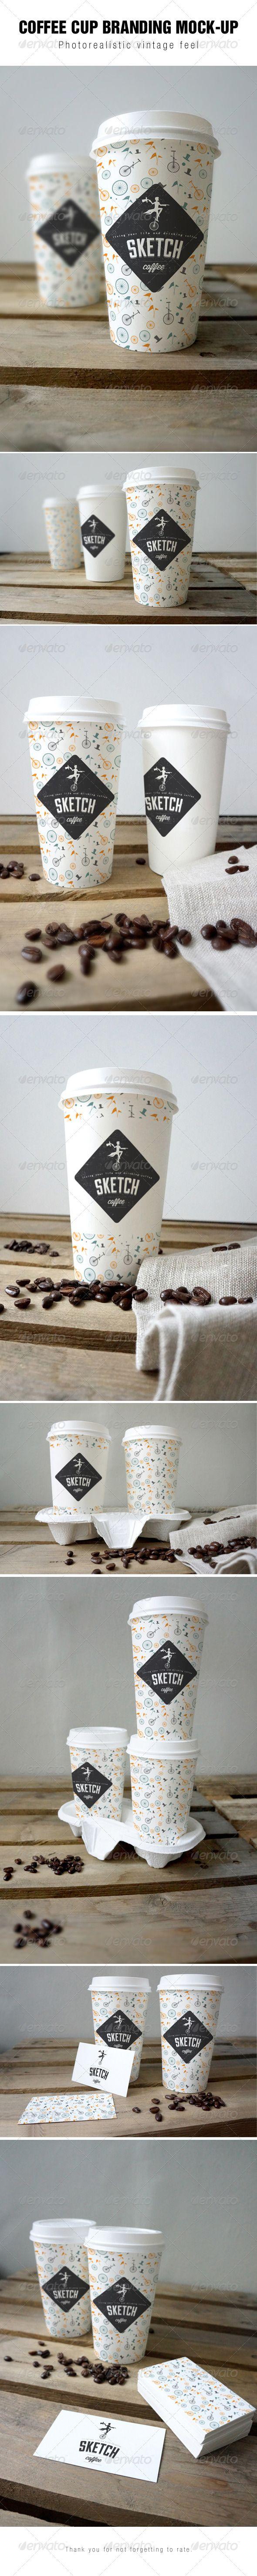 Coffee cup branding Mock-up - Food and Drink Packaging